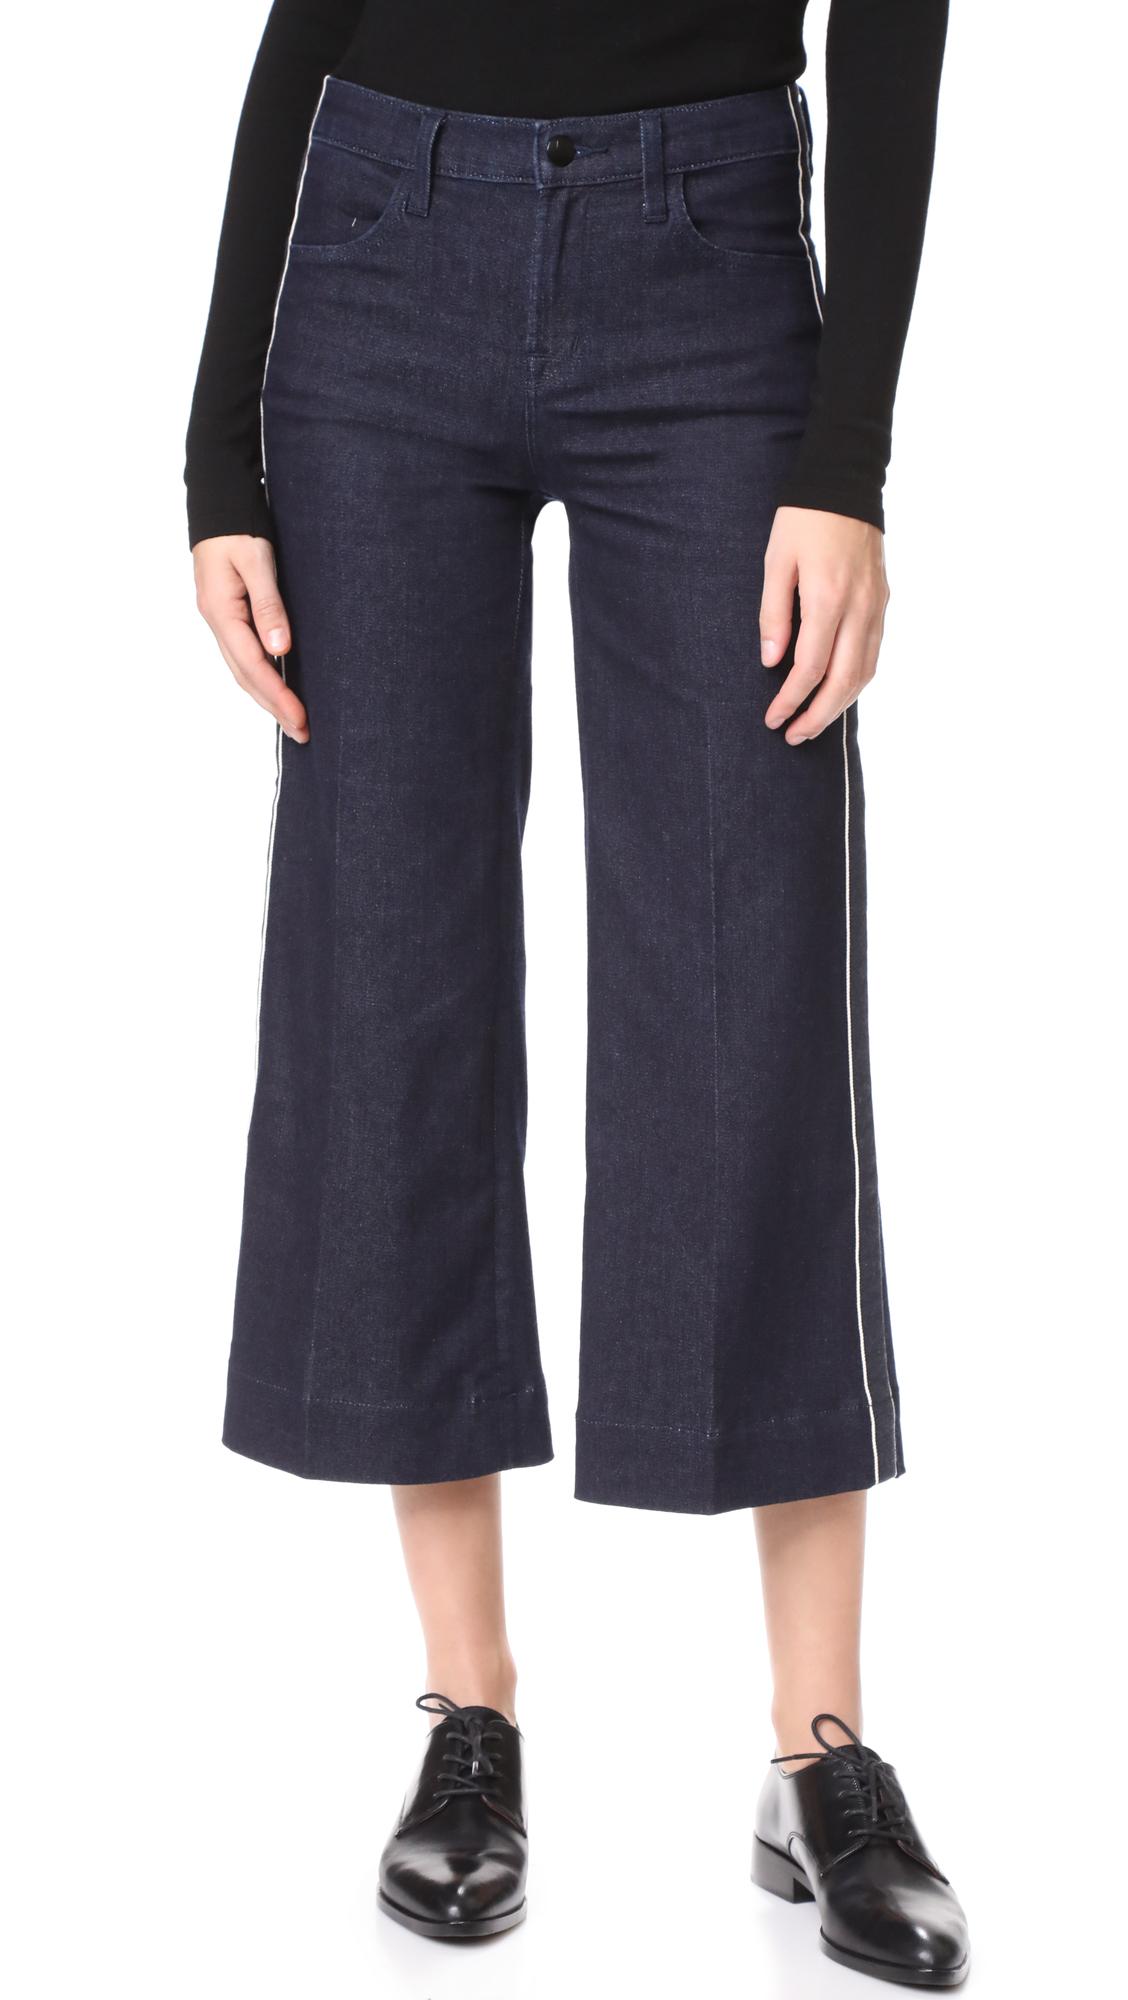 J Brand Liza Mid Rise Culotte Jeans - Border